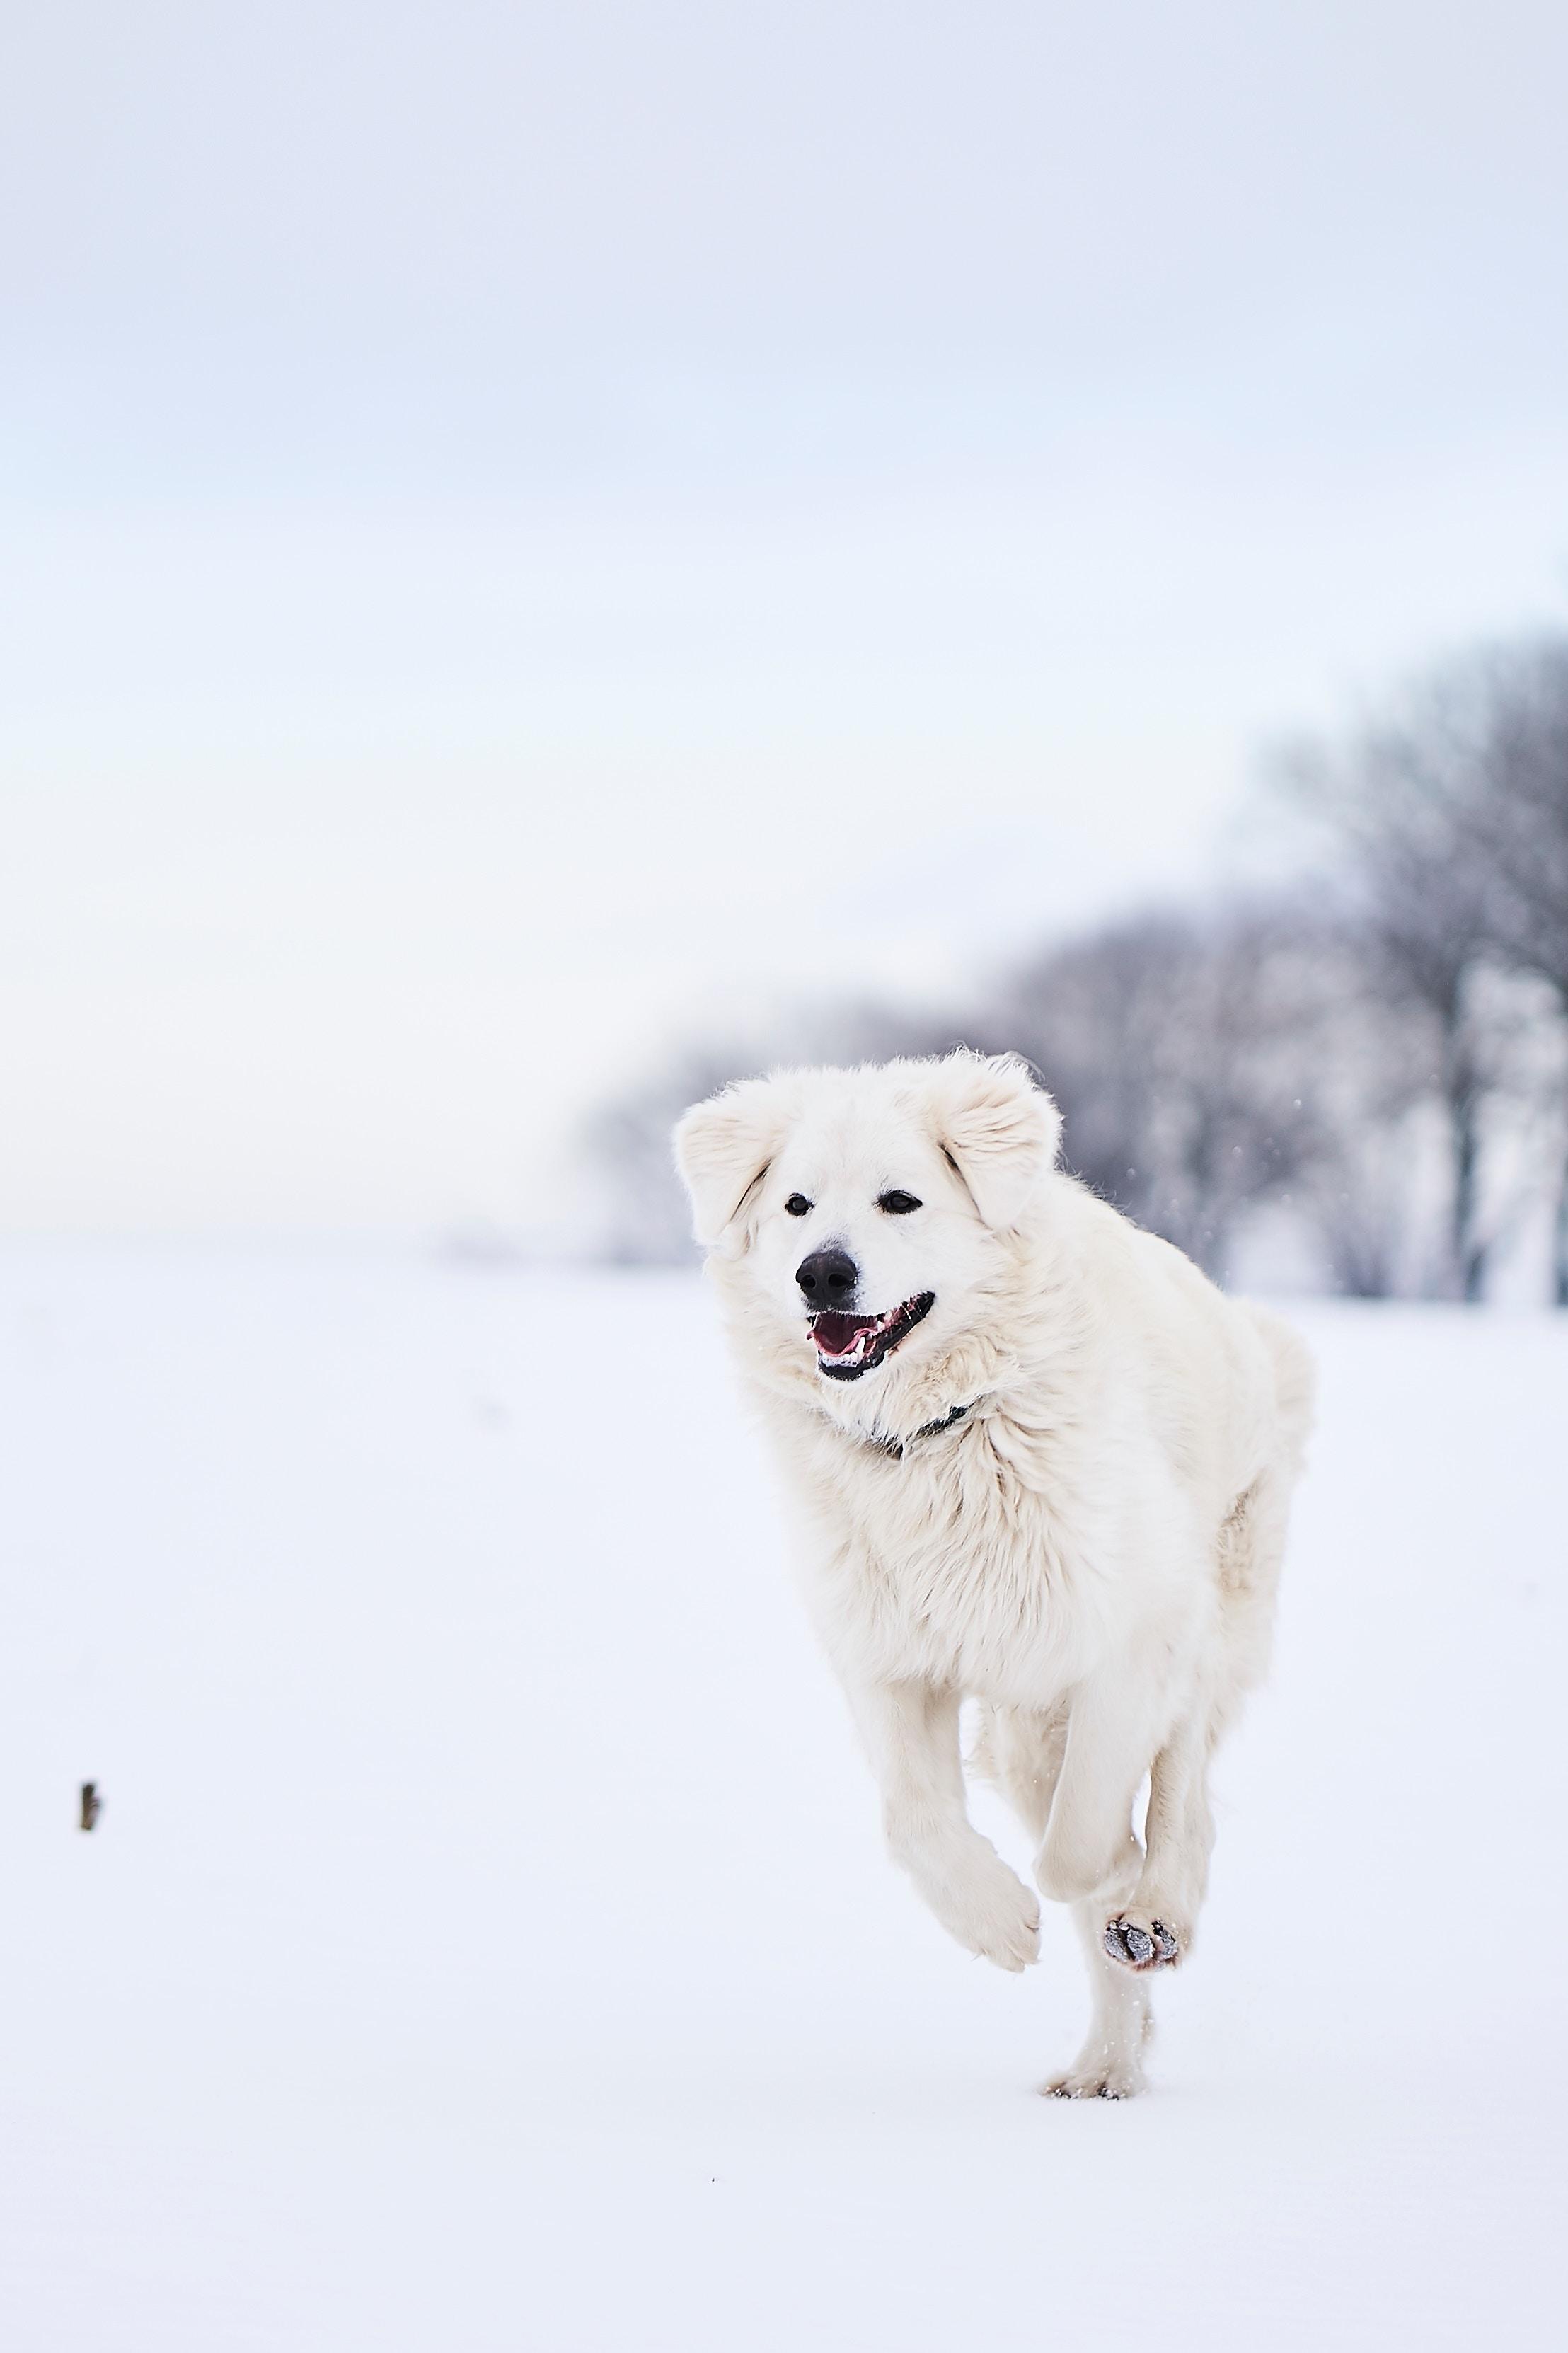 134024 download wallpaper Animals, Pyrenean Mountain Dog, Iberian Mountain Dog, Big Pyrenees, Great Piraeus, Dog, Snow, Run, Running screensavers and pictures for free